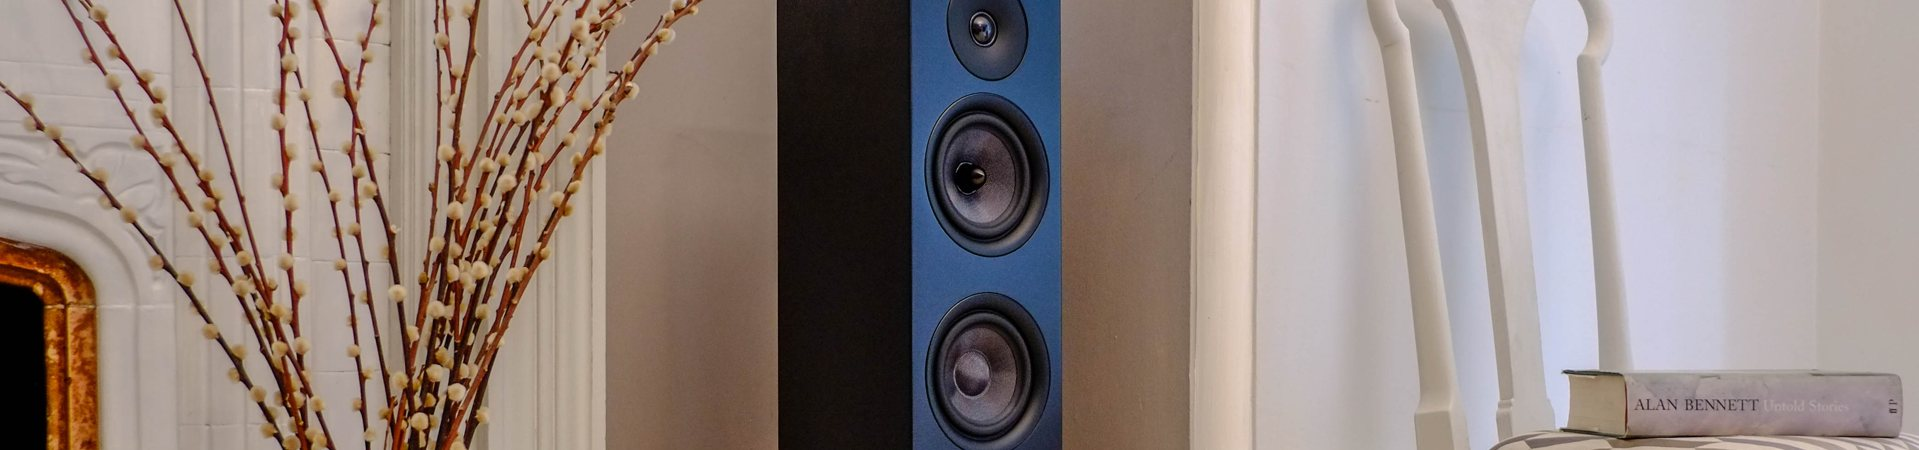 roth speaker